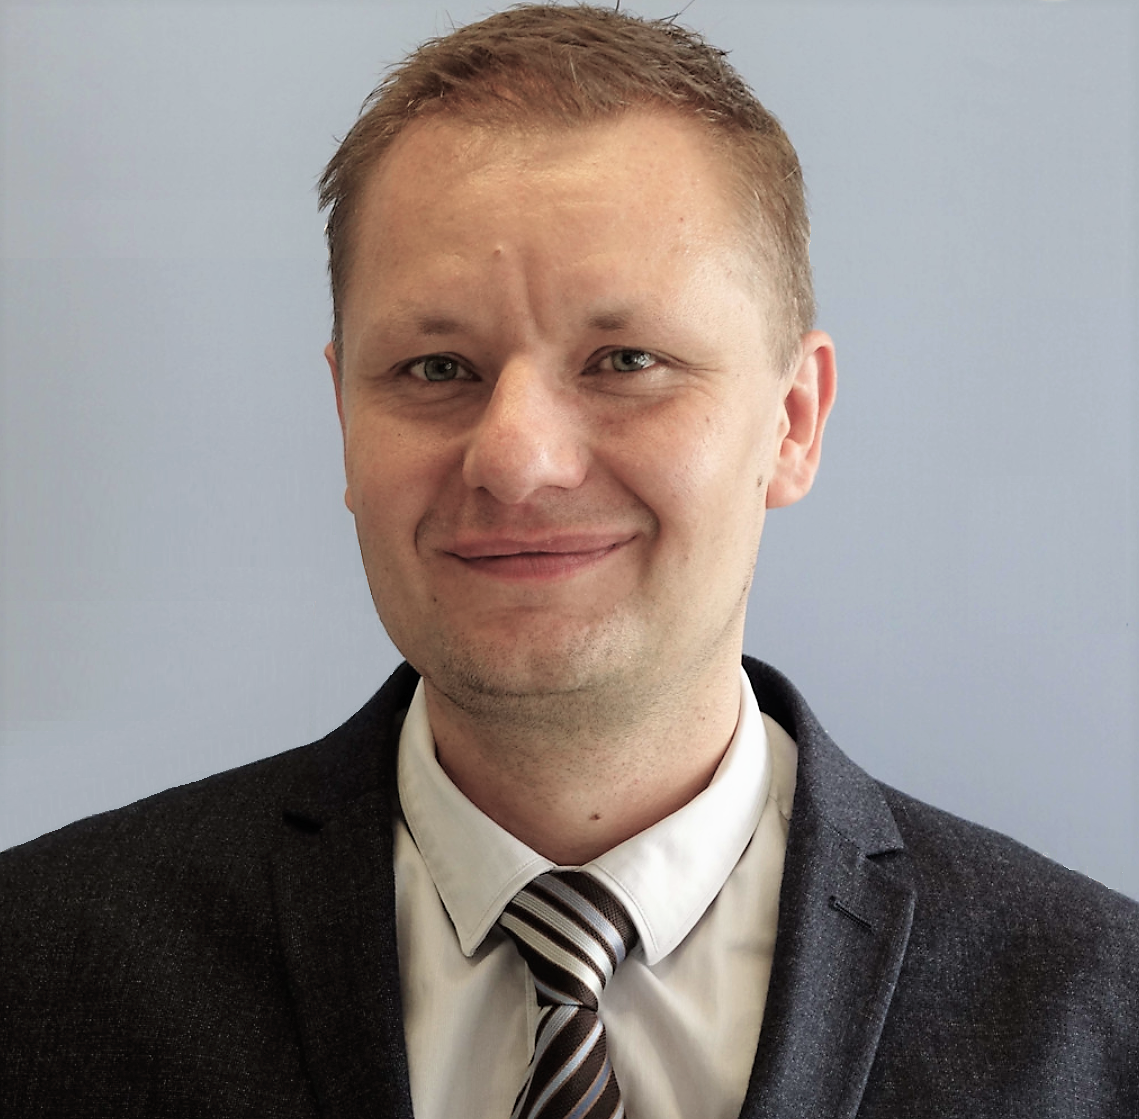 Unser Dozent André Bergmann